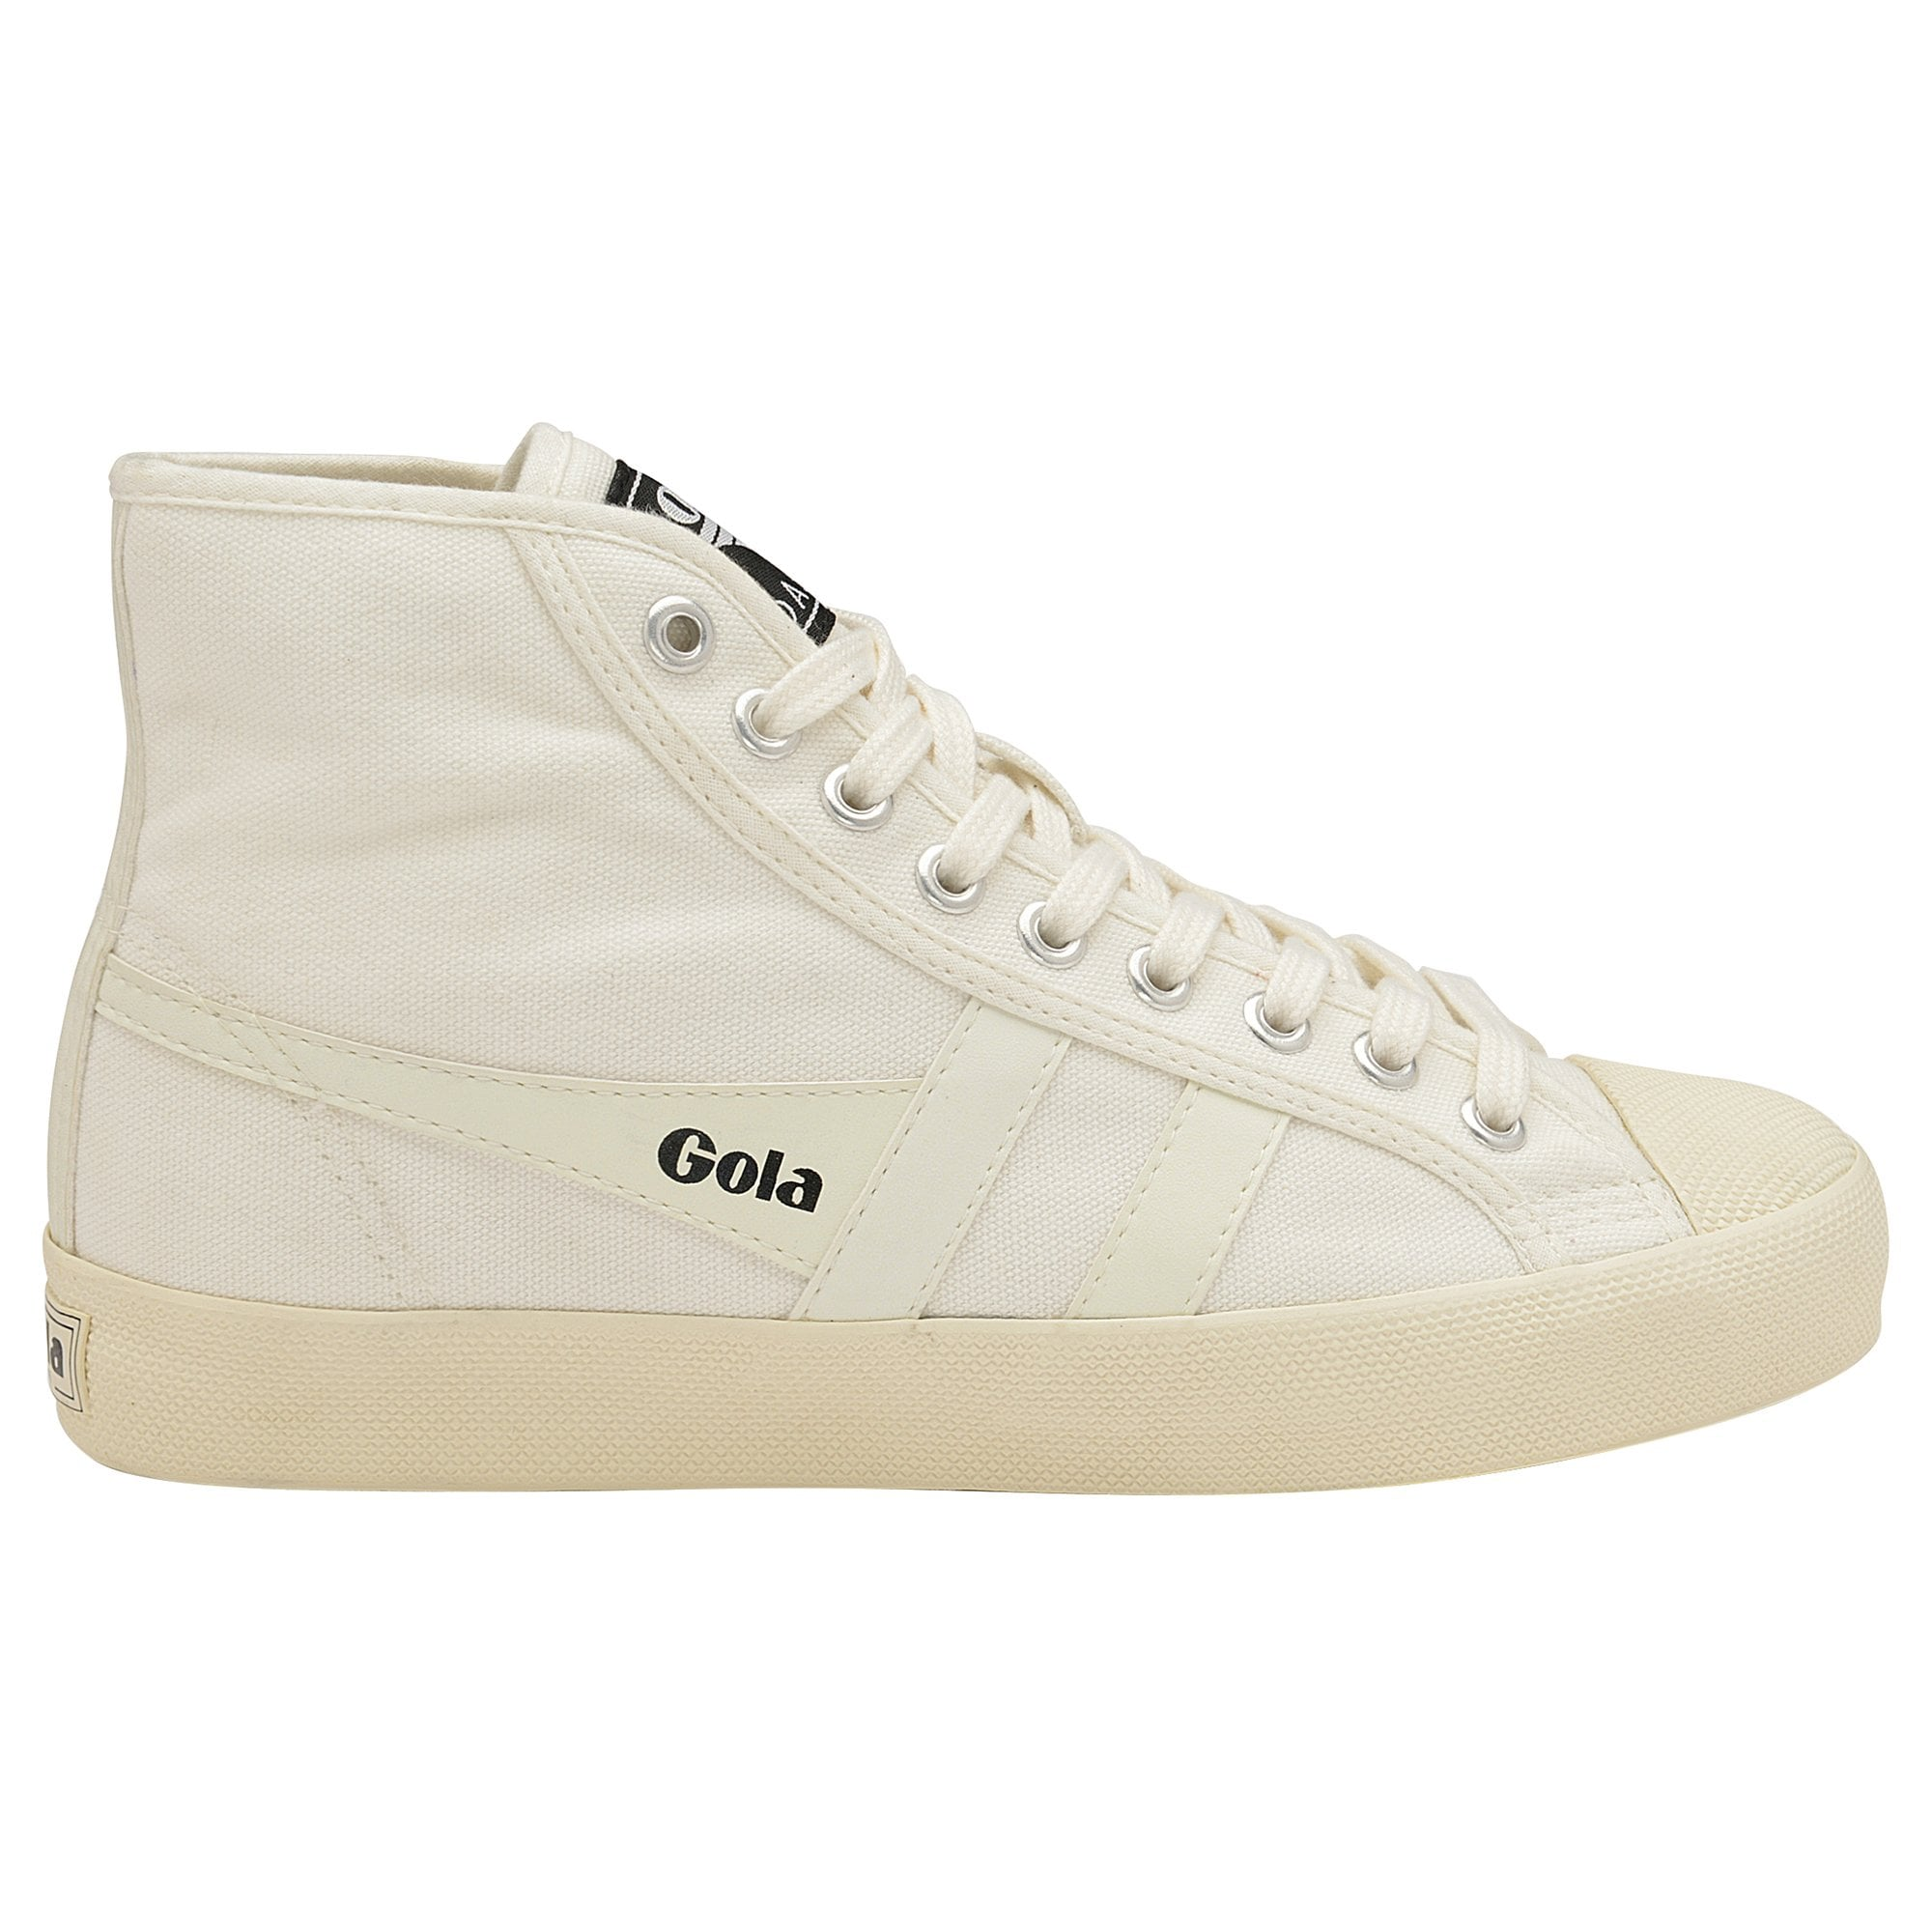 Buy Gola womens Coaster High sneaker